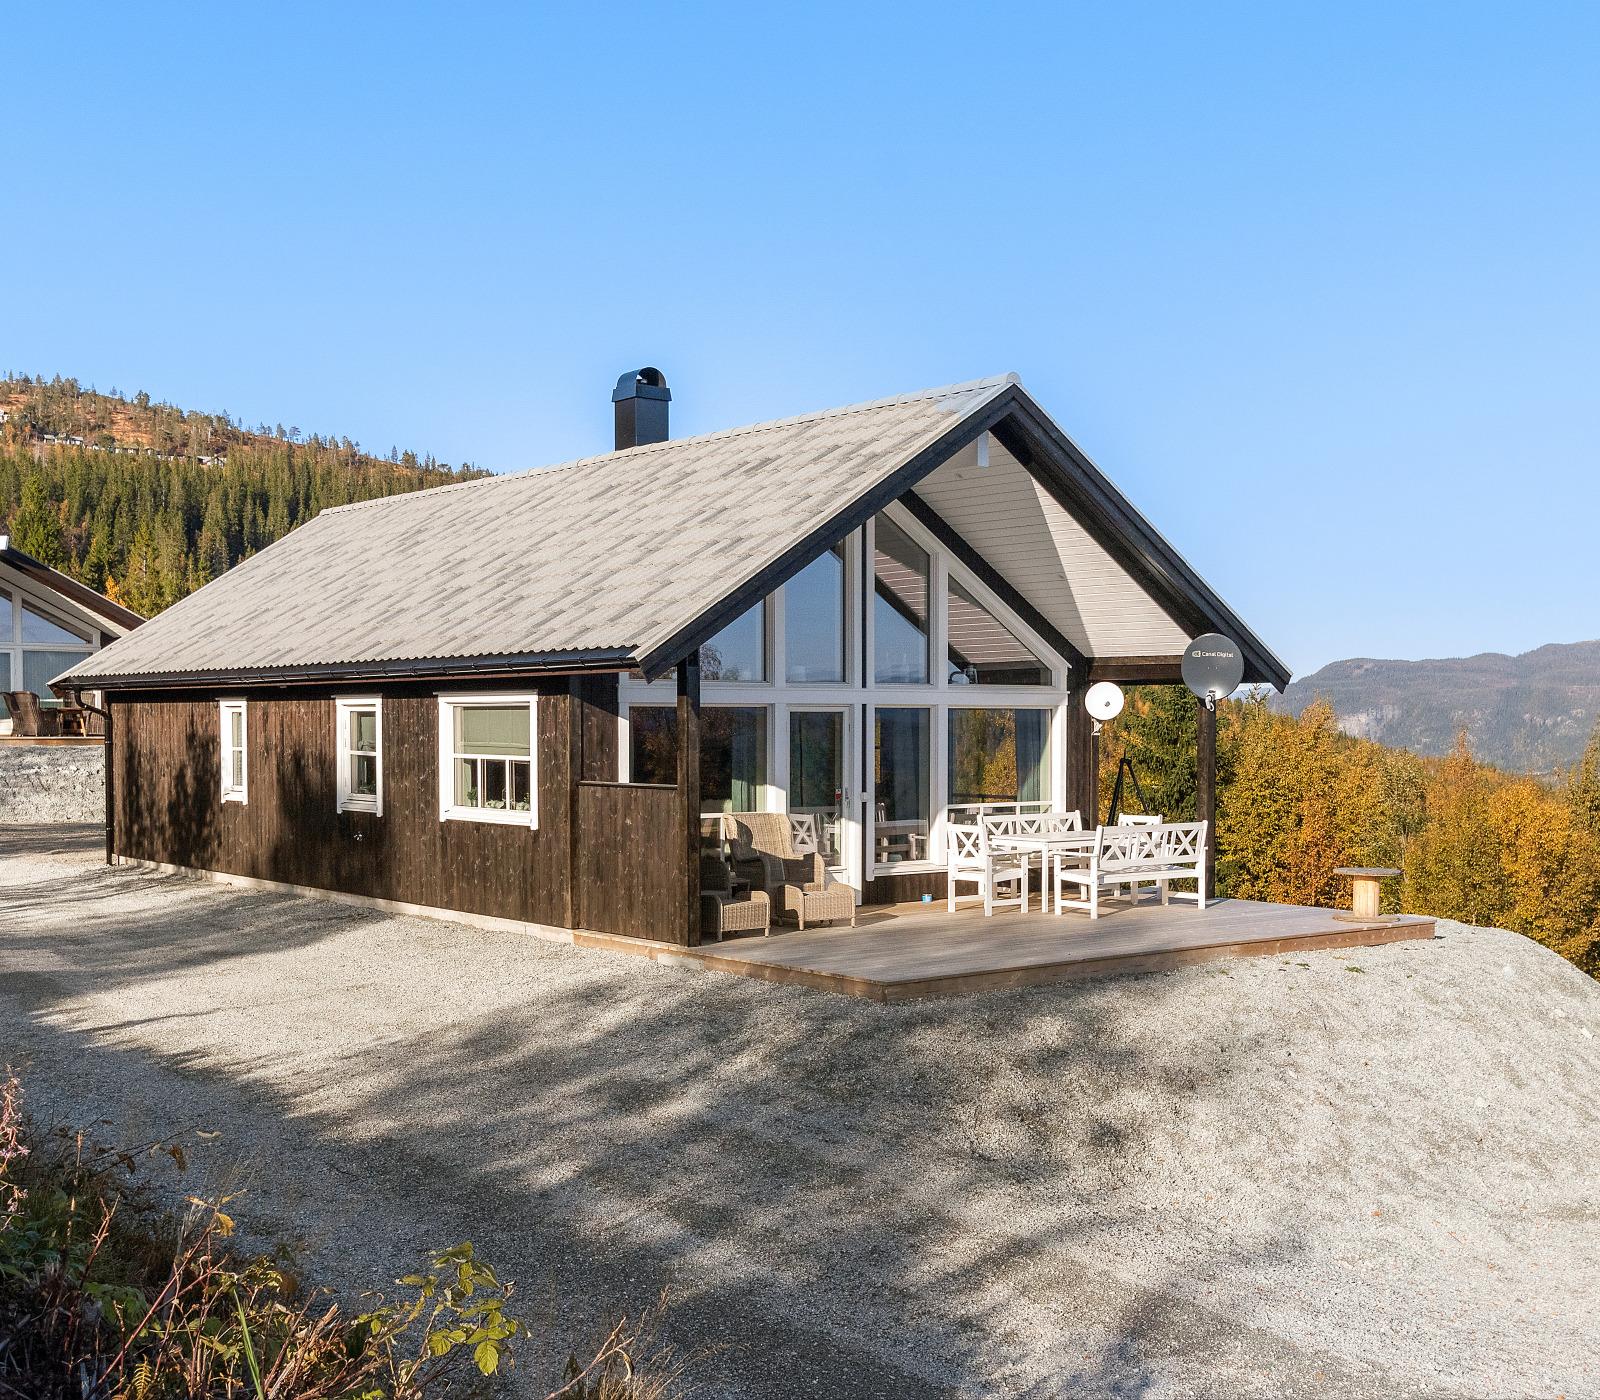 Bygge hus eller hytte